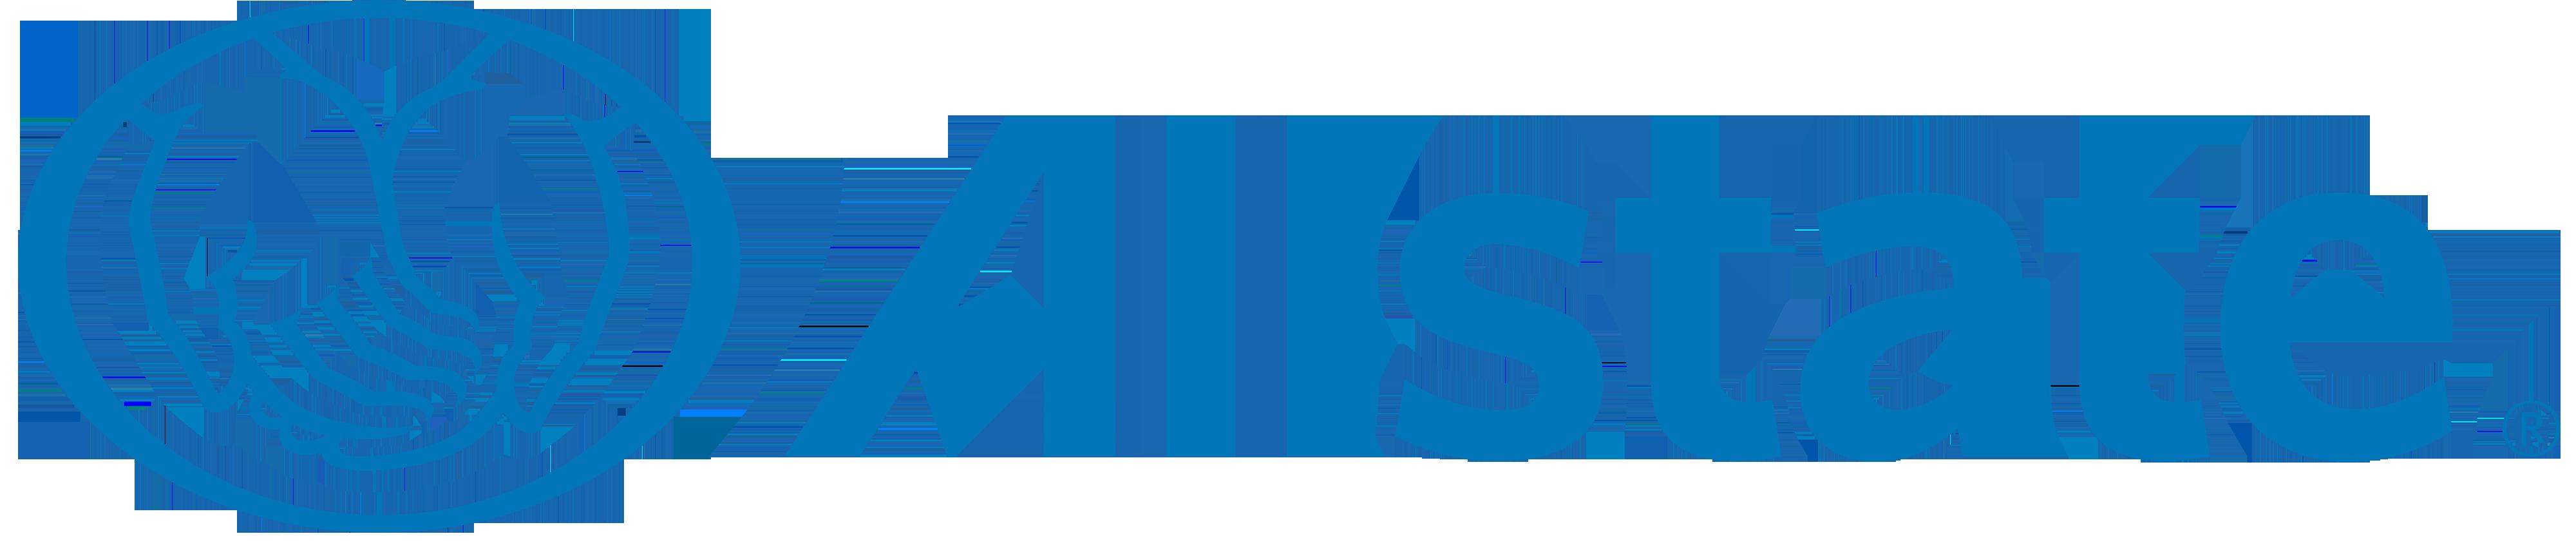 Shauna Johnson: Allstate Insurance